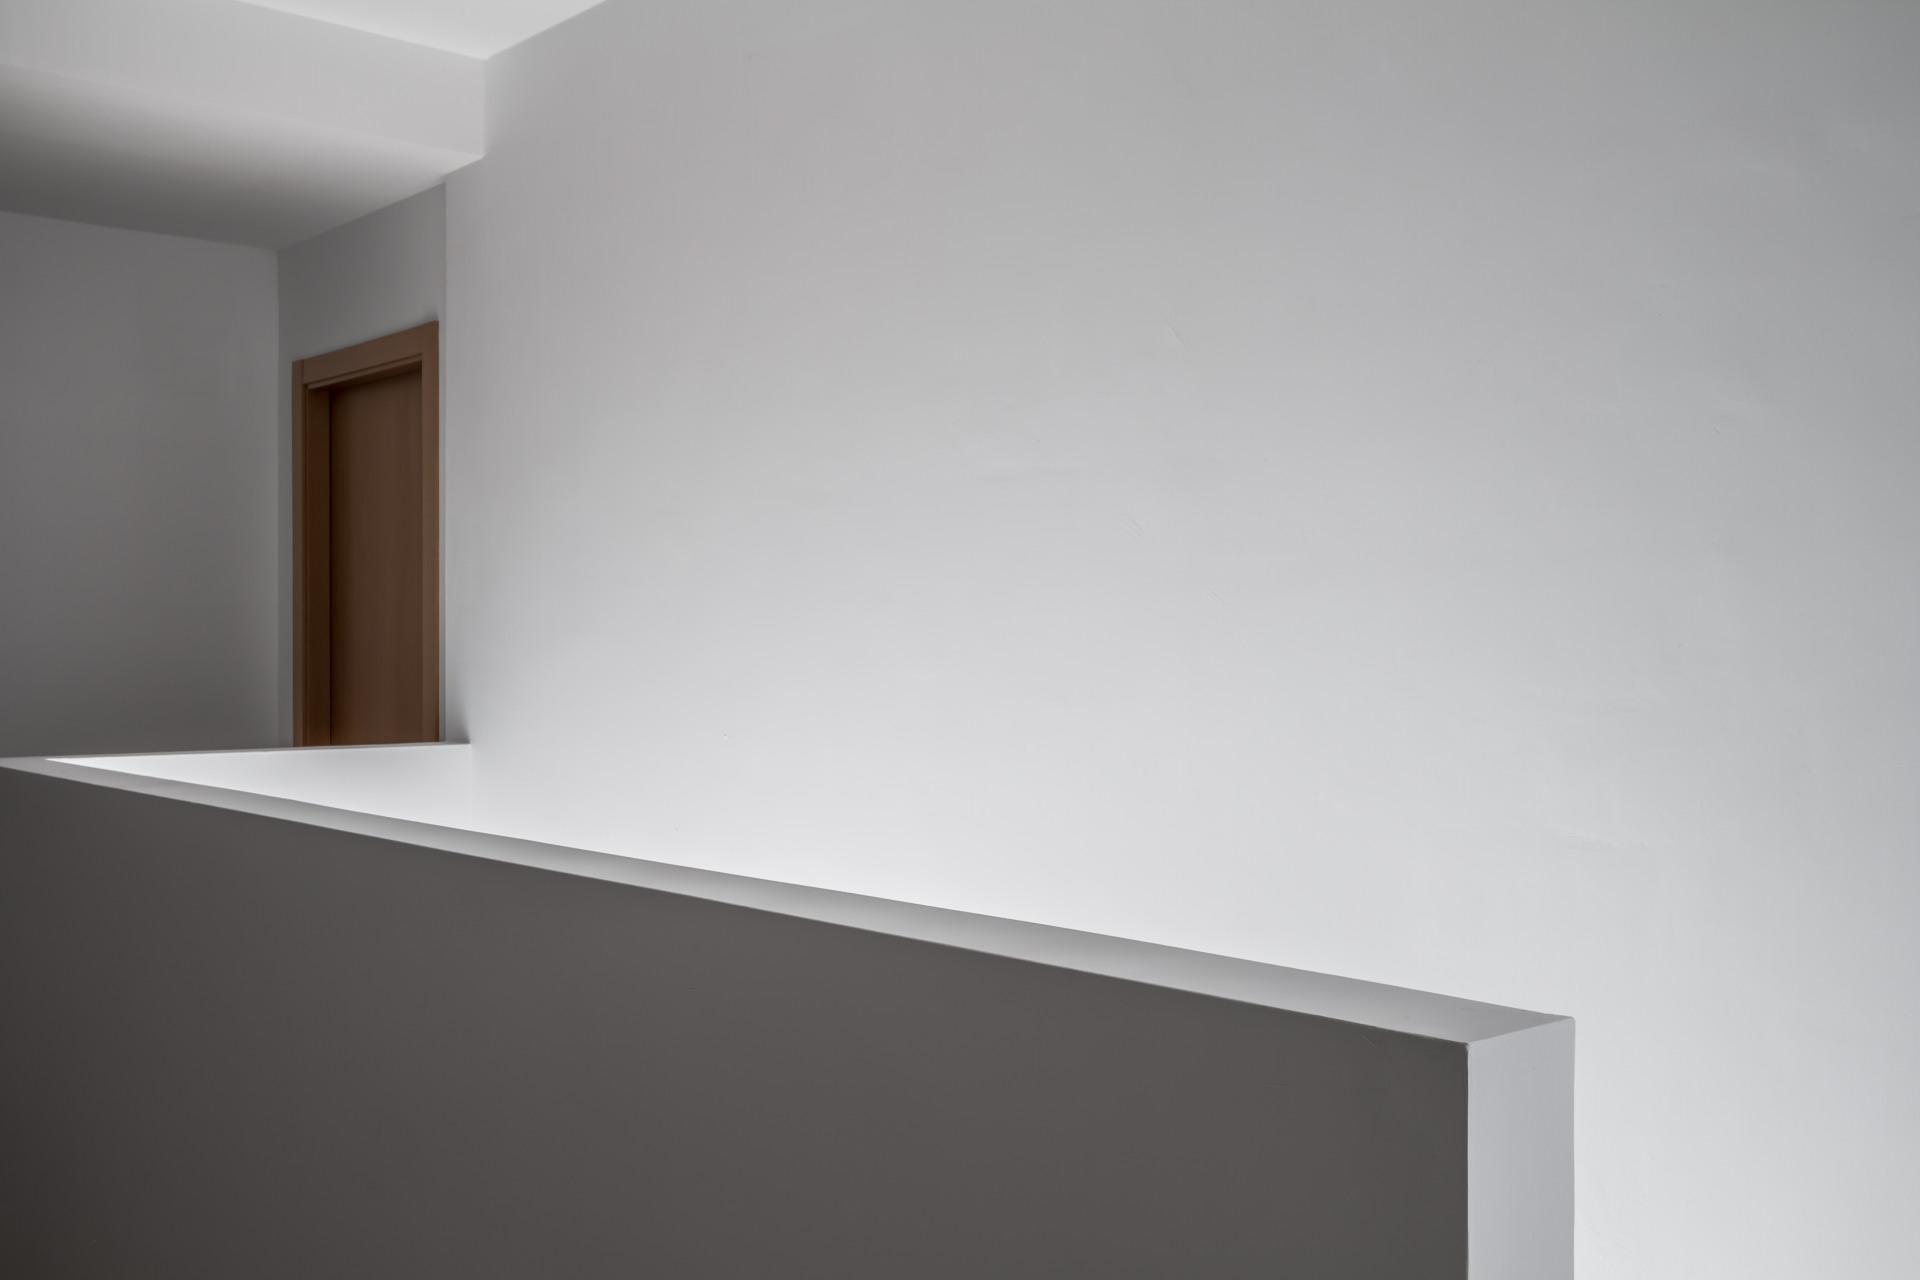 fotografia-arquitectura-valencia-german-cabo-viraje-sagunto (18)